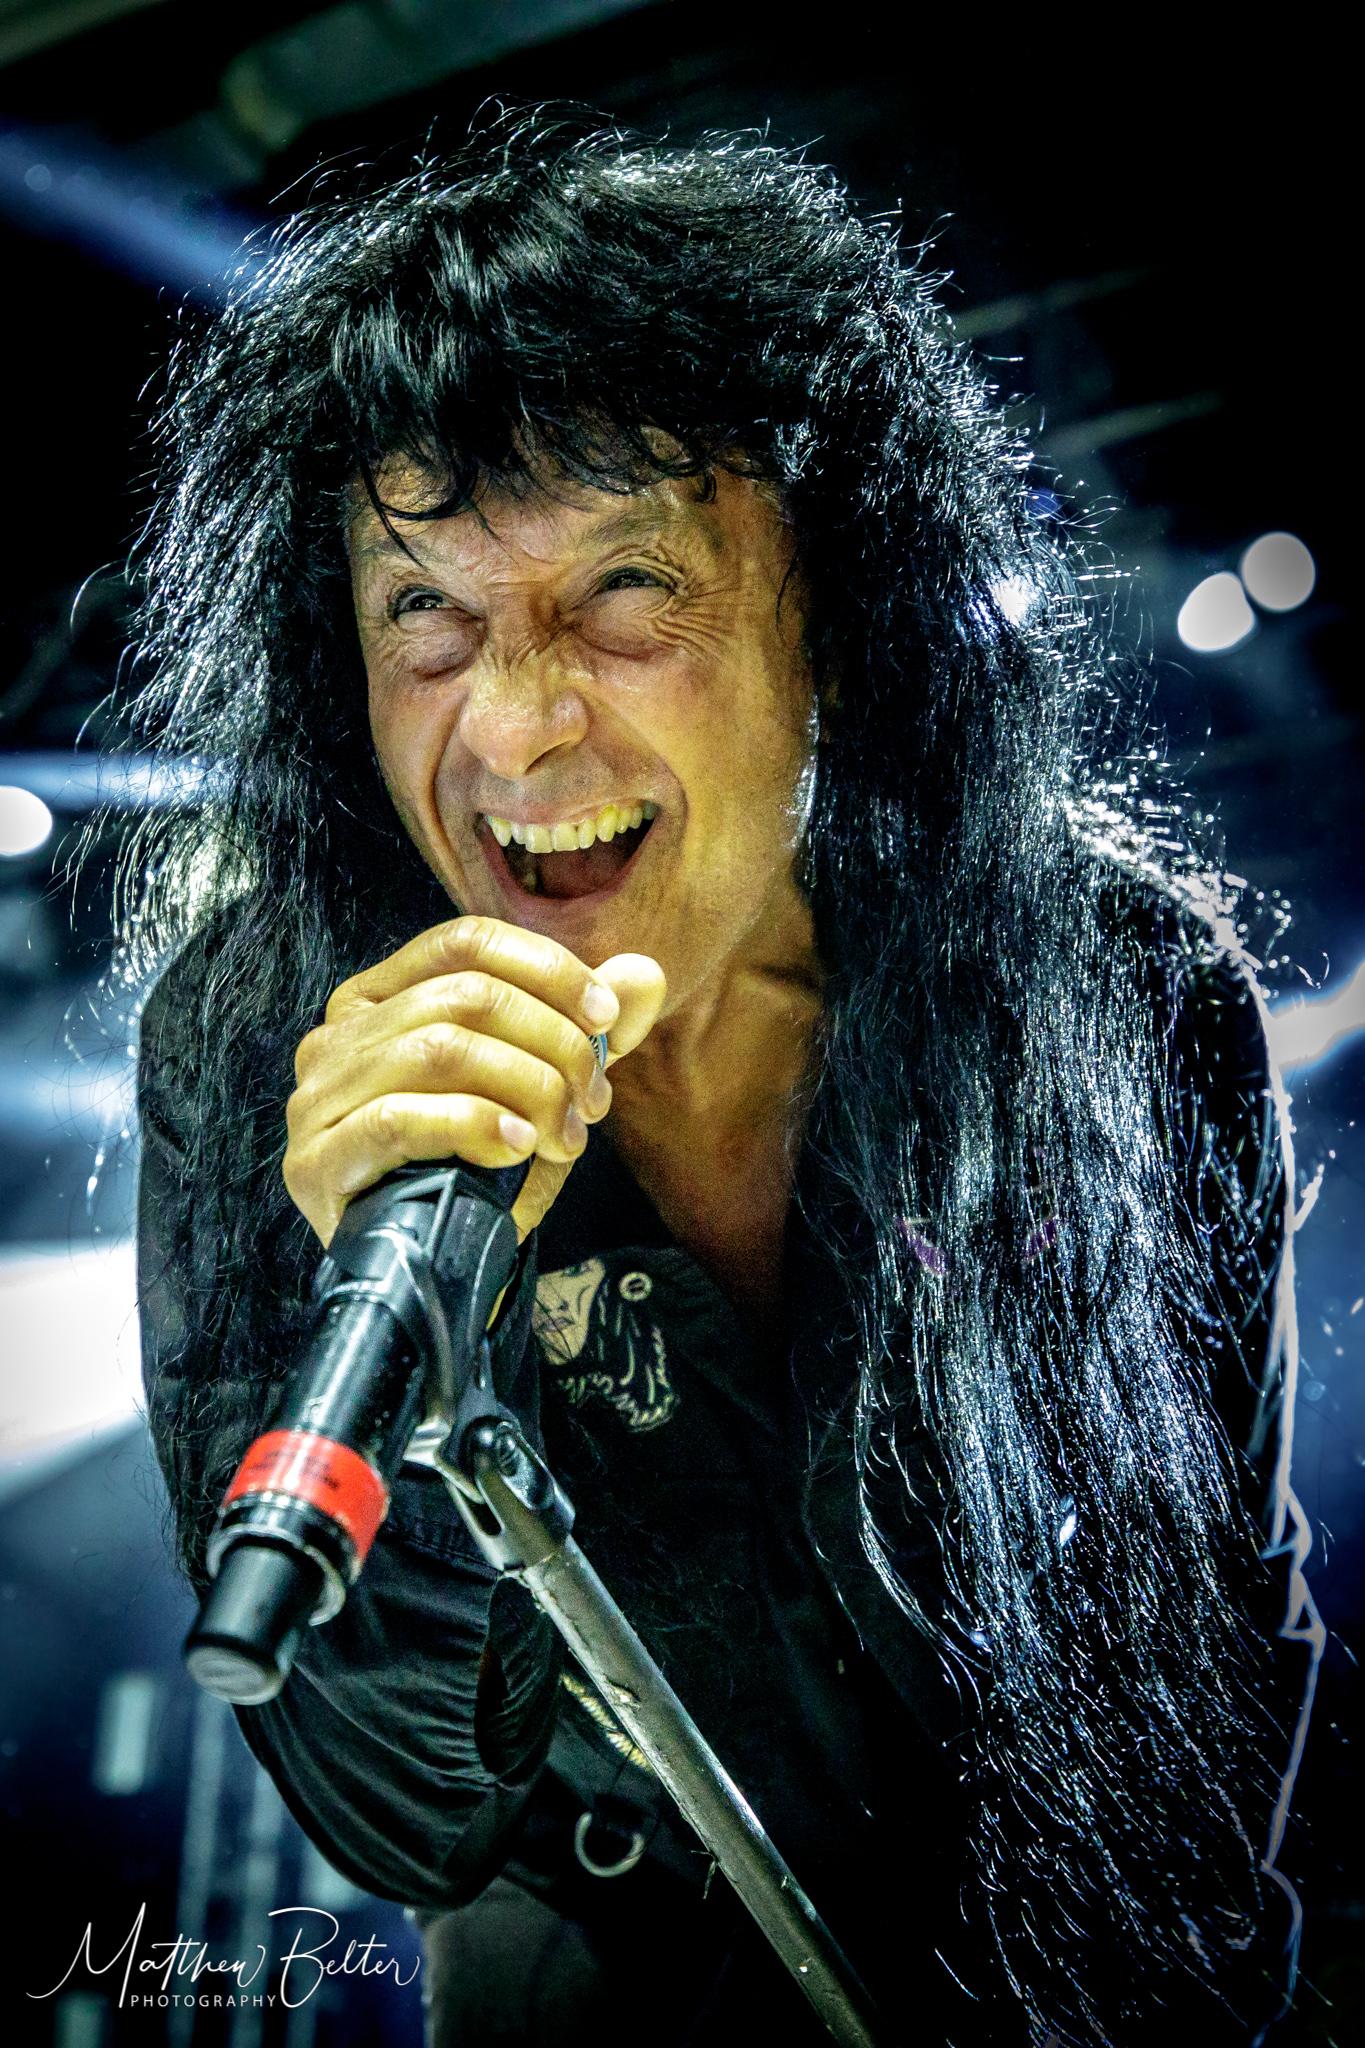 Joey Belladonna- Anthrax